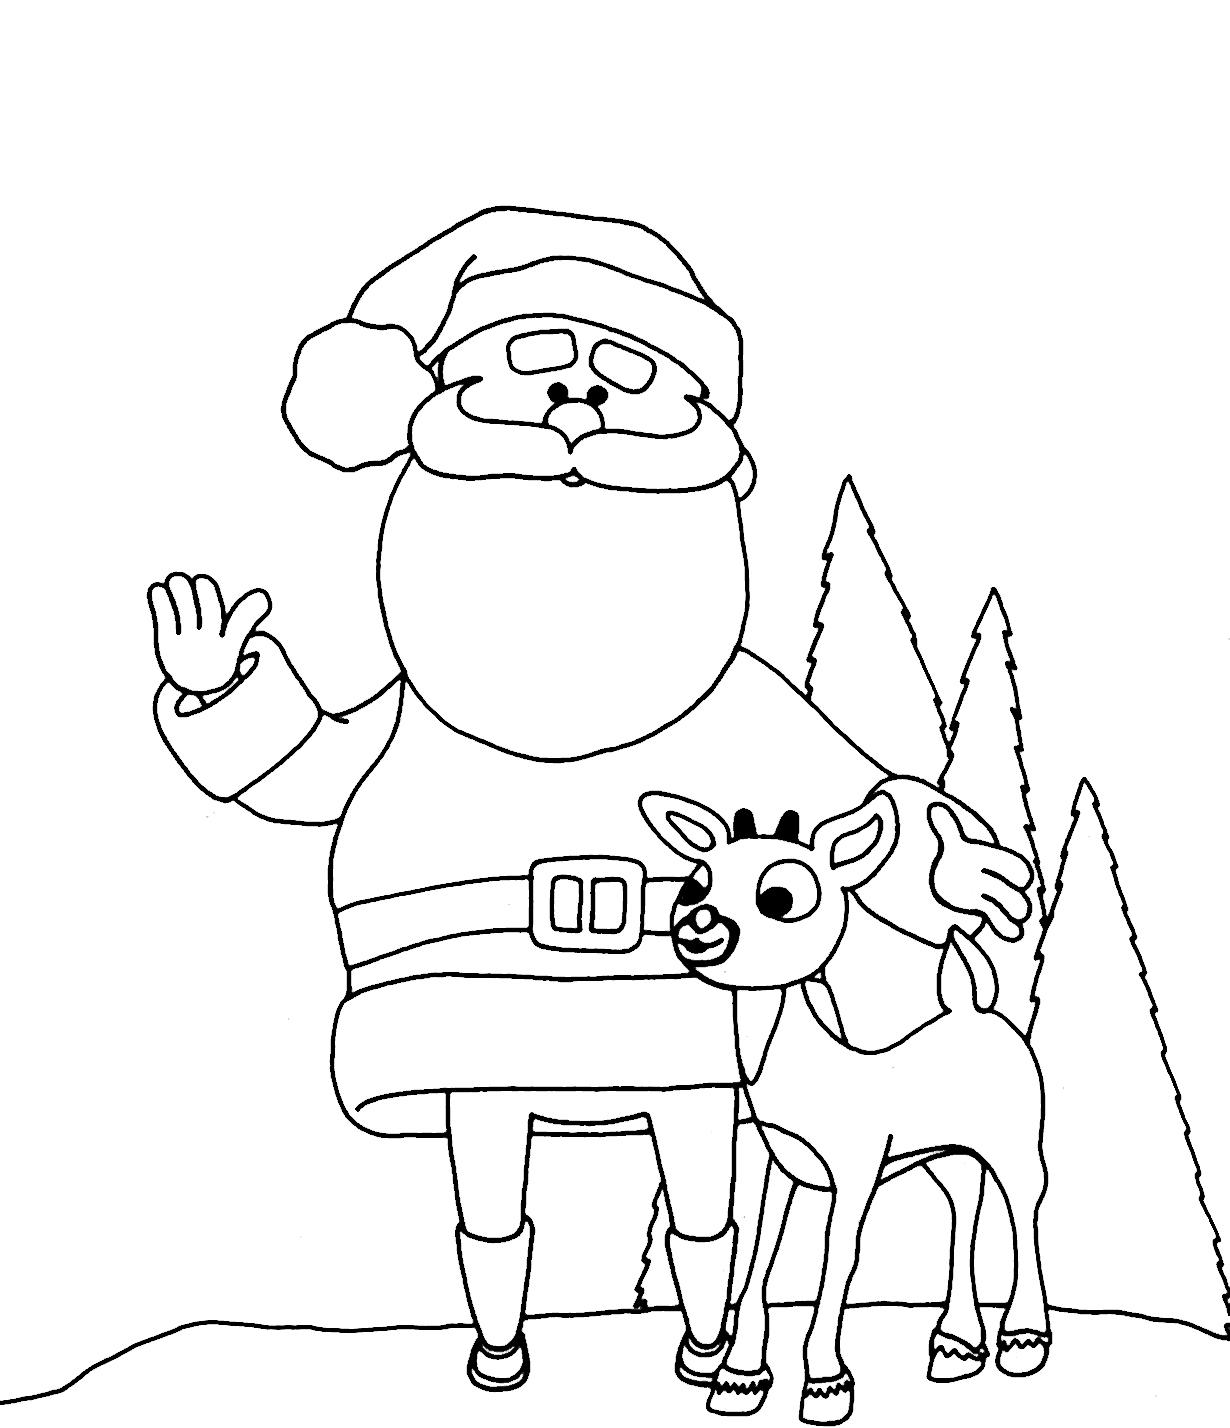 1230x1428 Christmas Santa Claus Coloring Pages